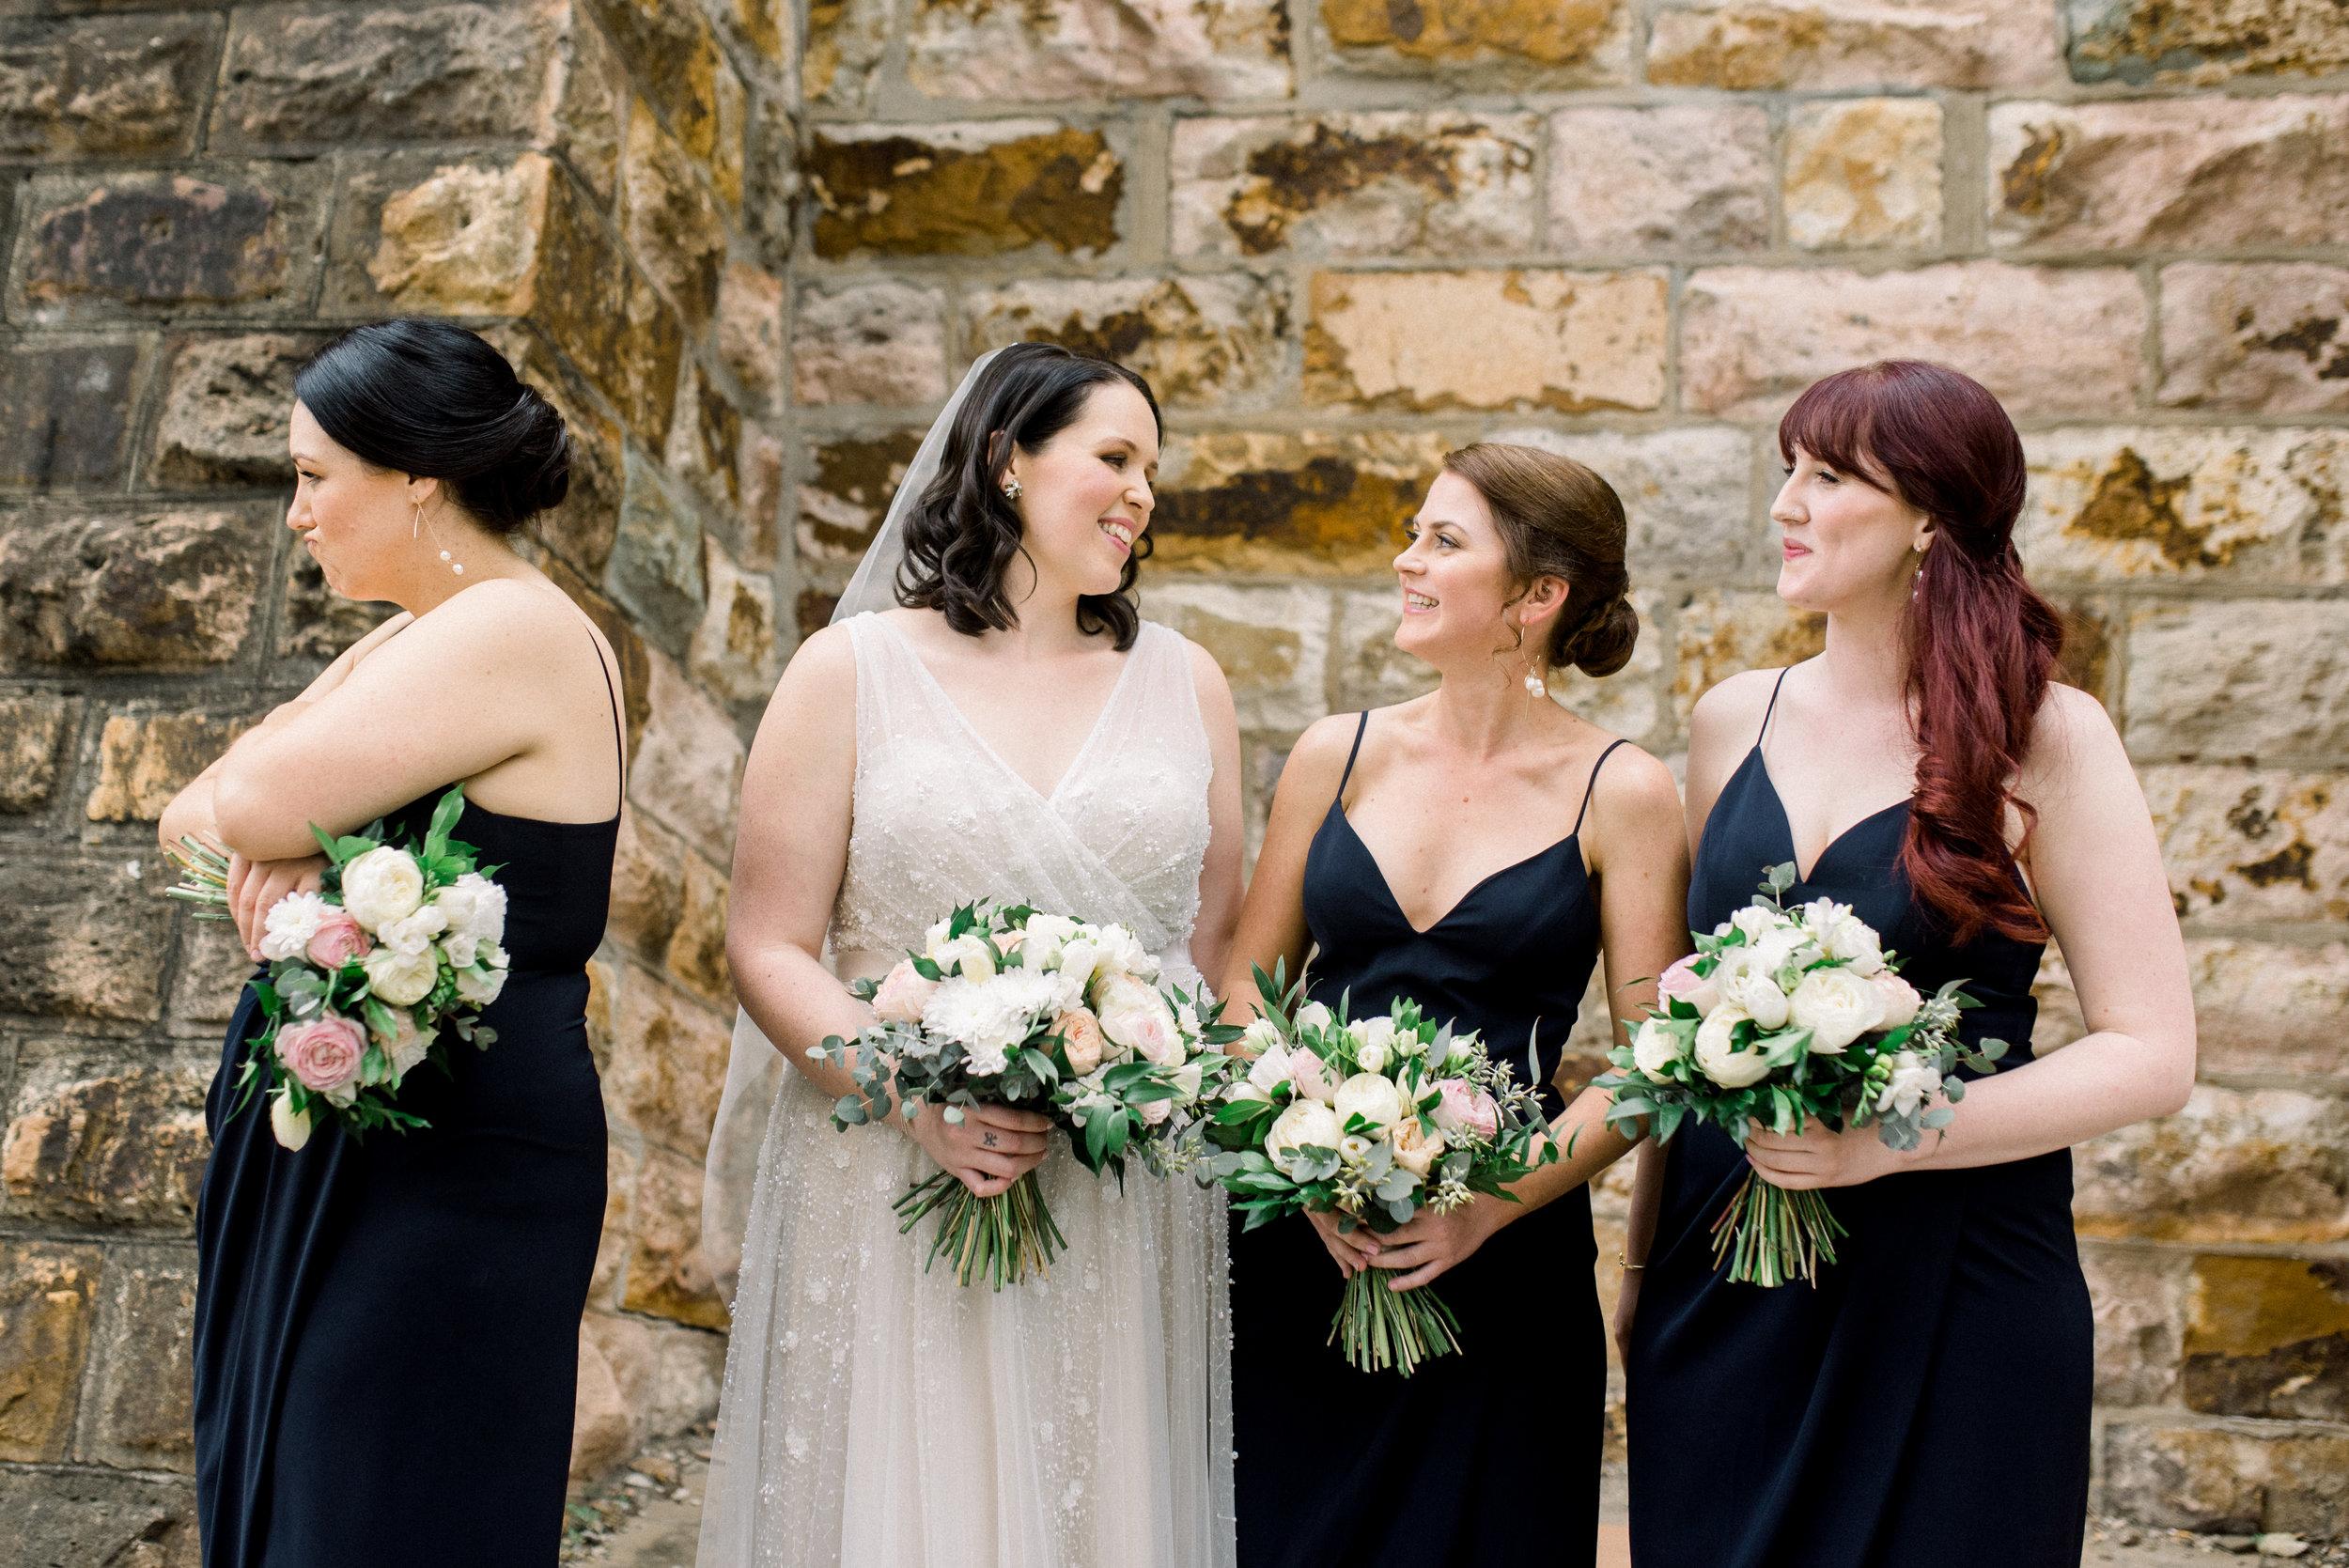 brisbane-city-wedding-photographer-romantic-wedding-54.jpg